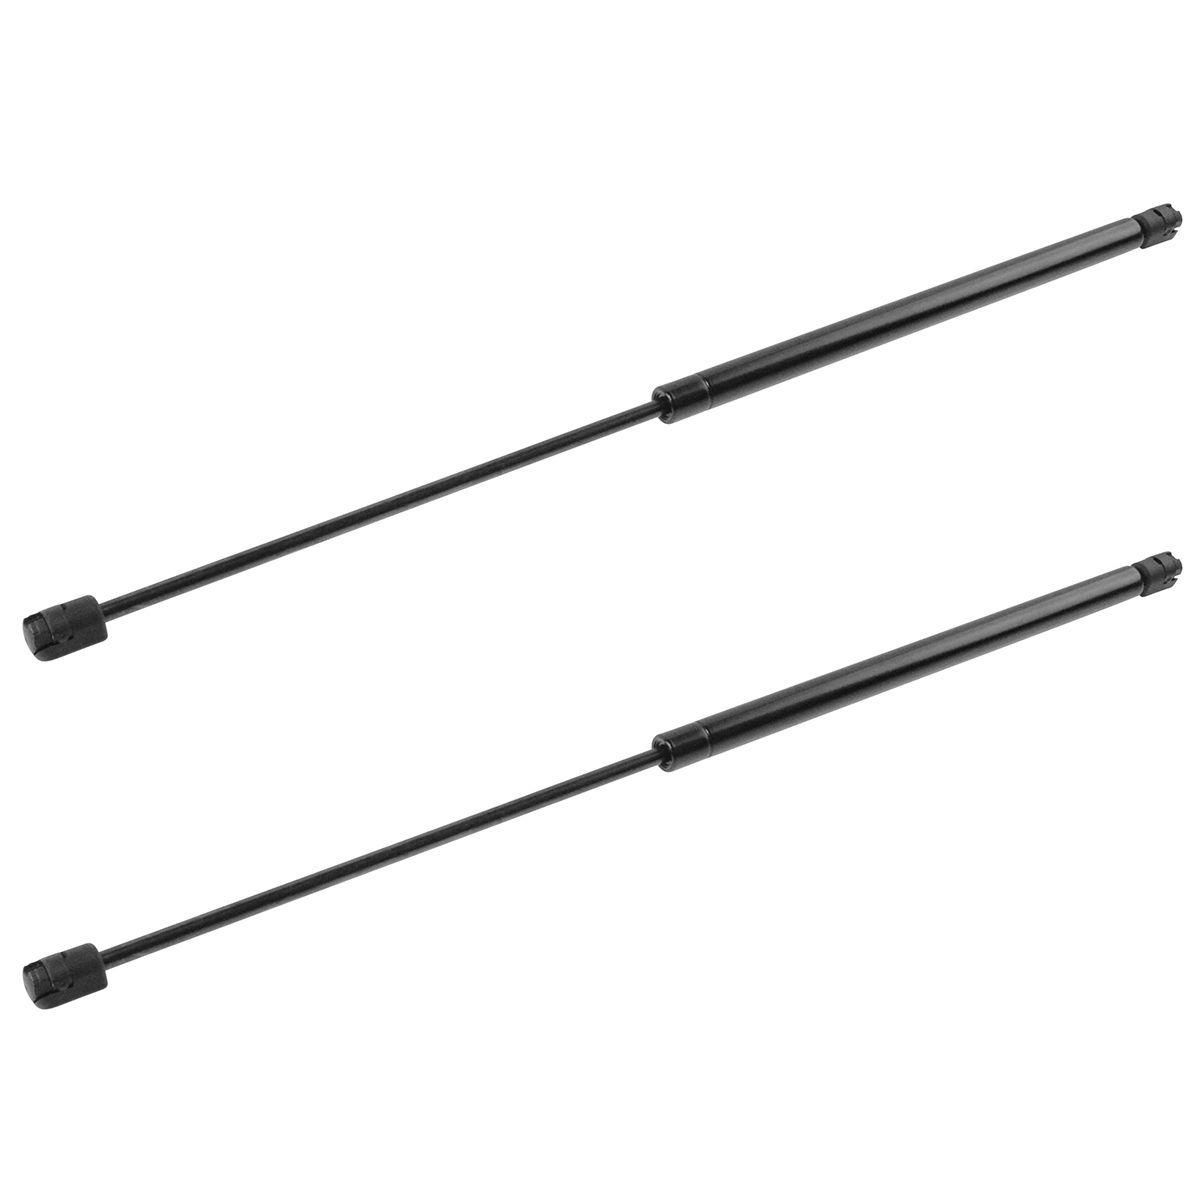 Trunk Lid Lift Support LH RH Pair Set of 2 for 98-10 Beetle Hatchback Hardtop